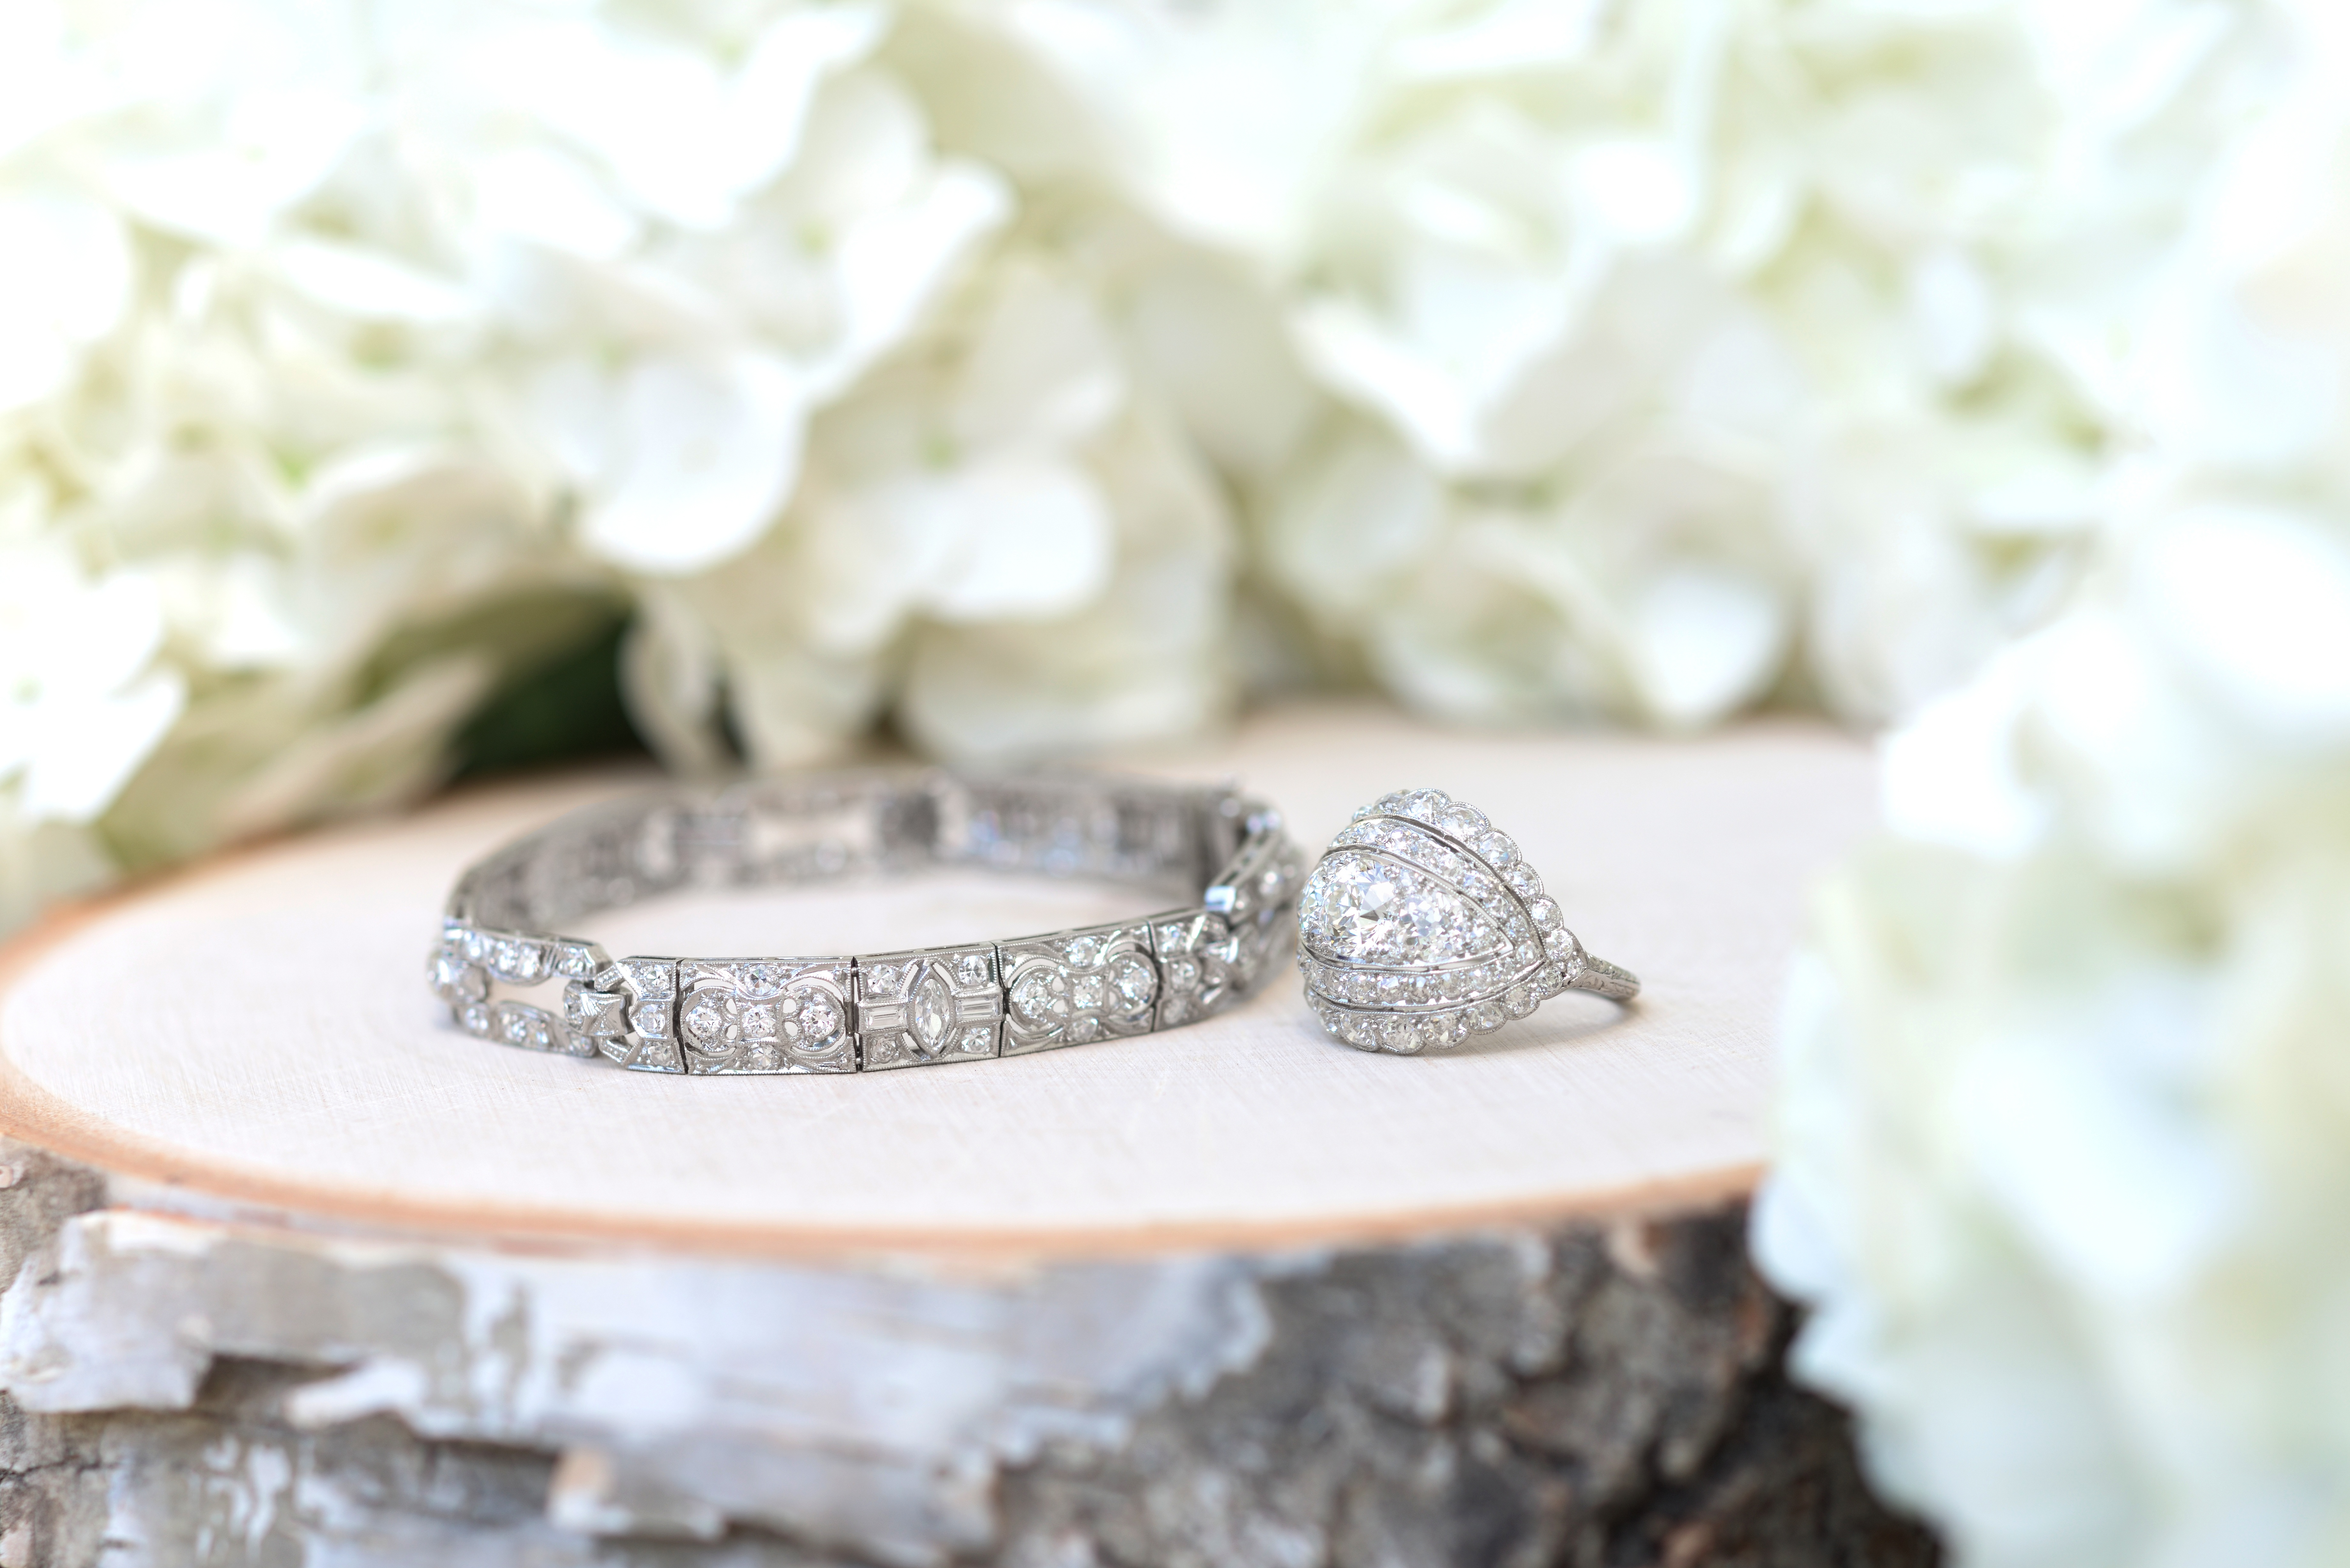 Beautiful Diamond Estate Jewelry Under $1,000